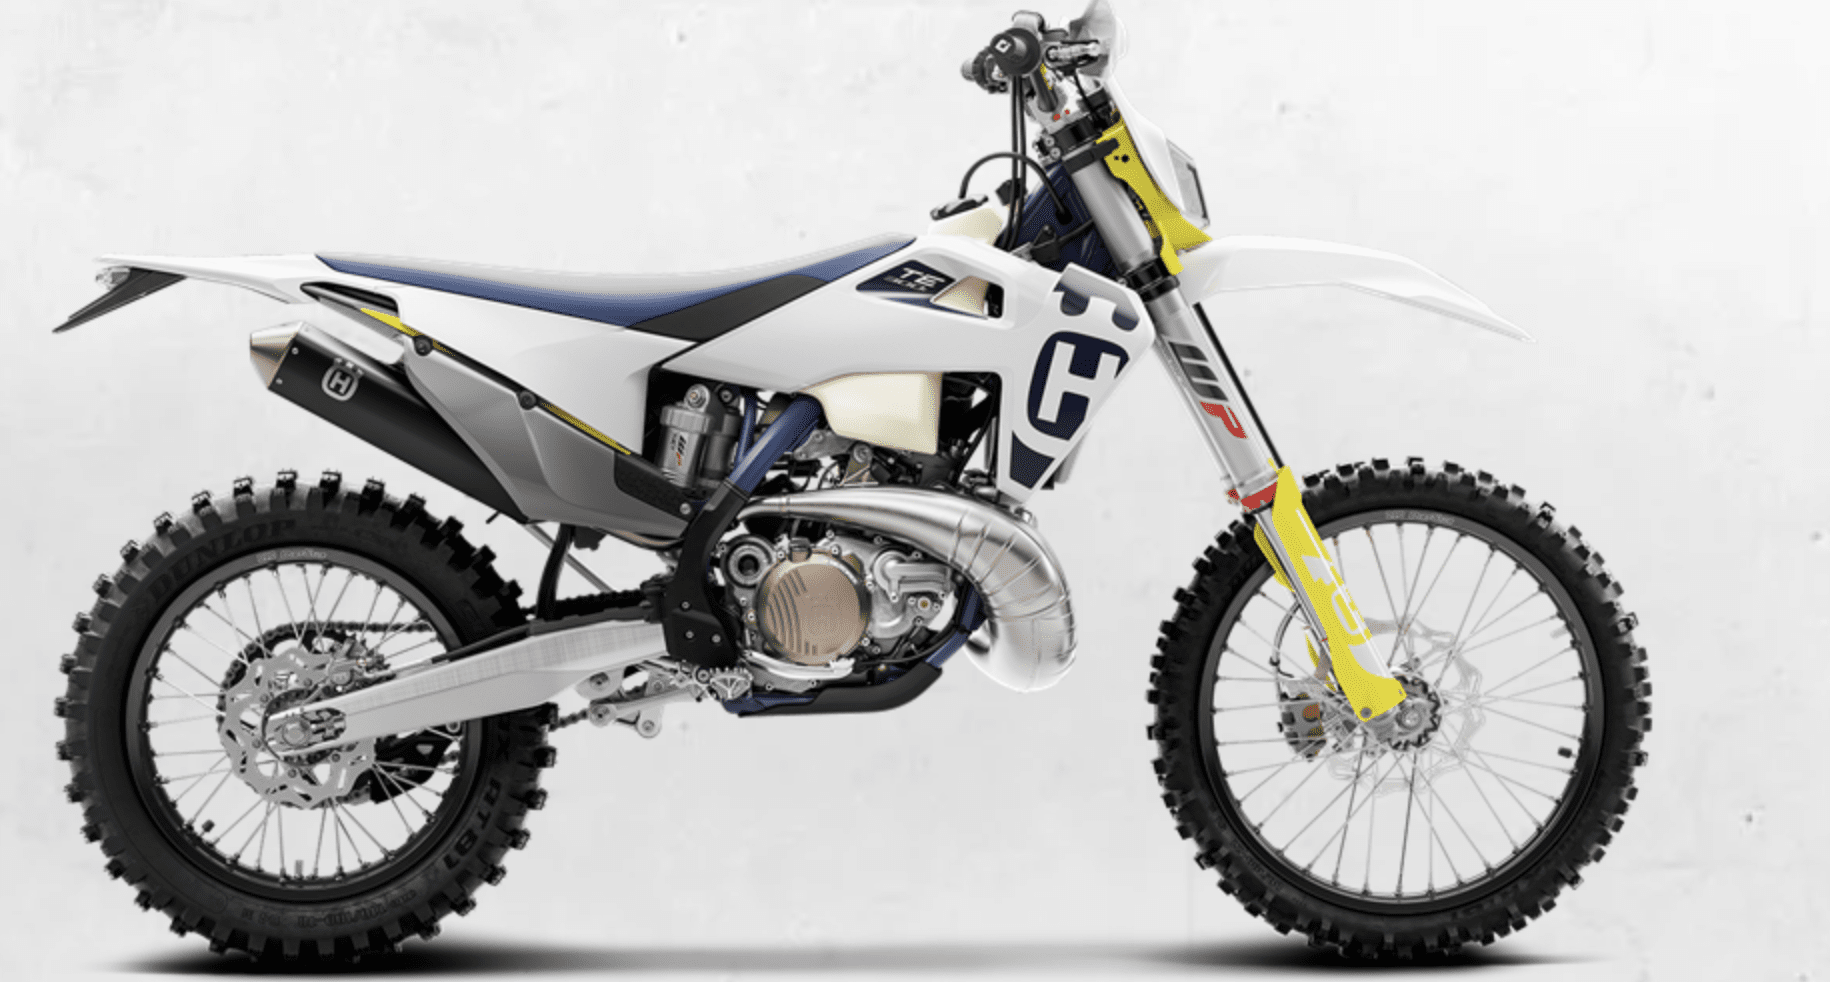 Husqvarna Dirt bikes